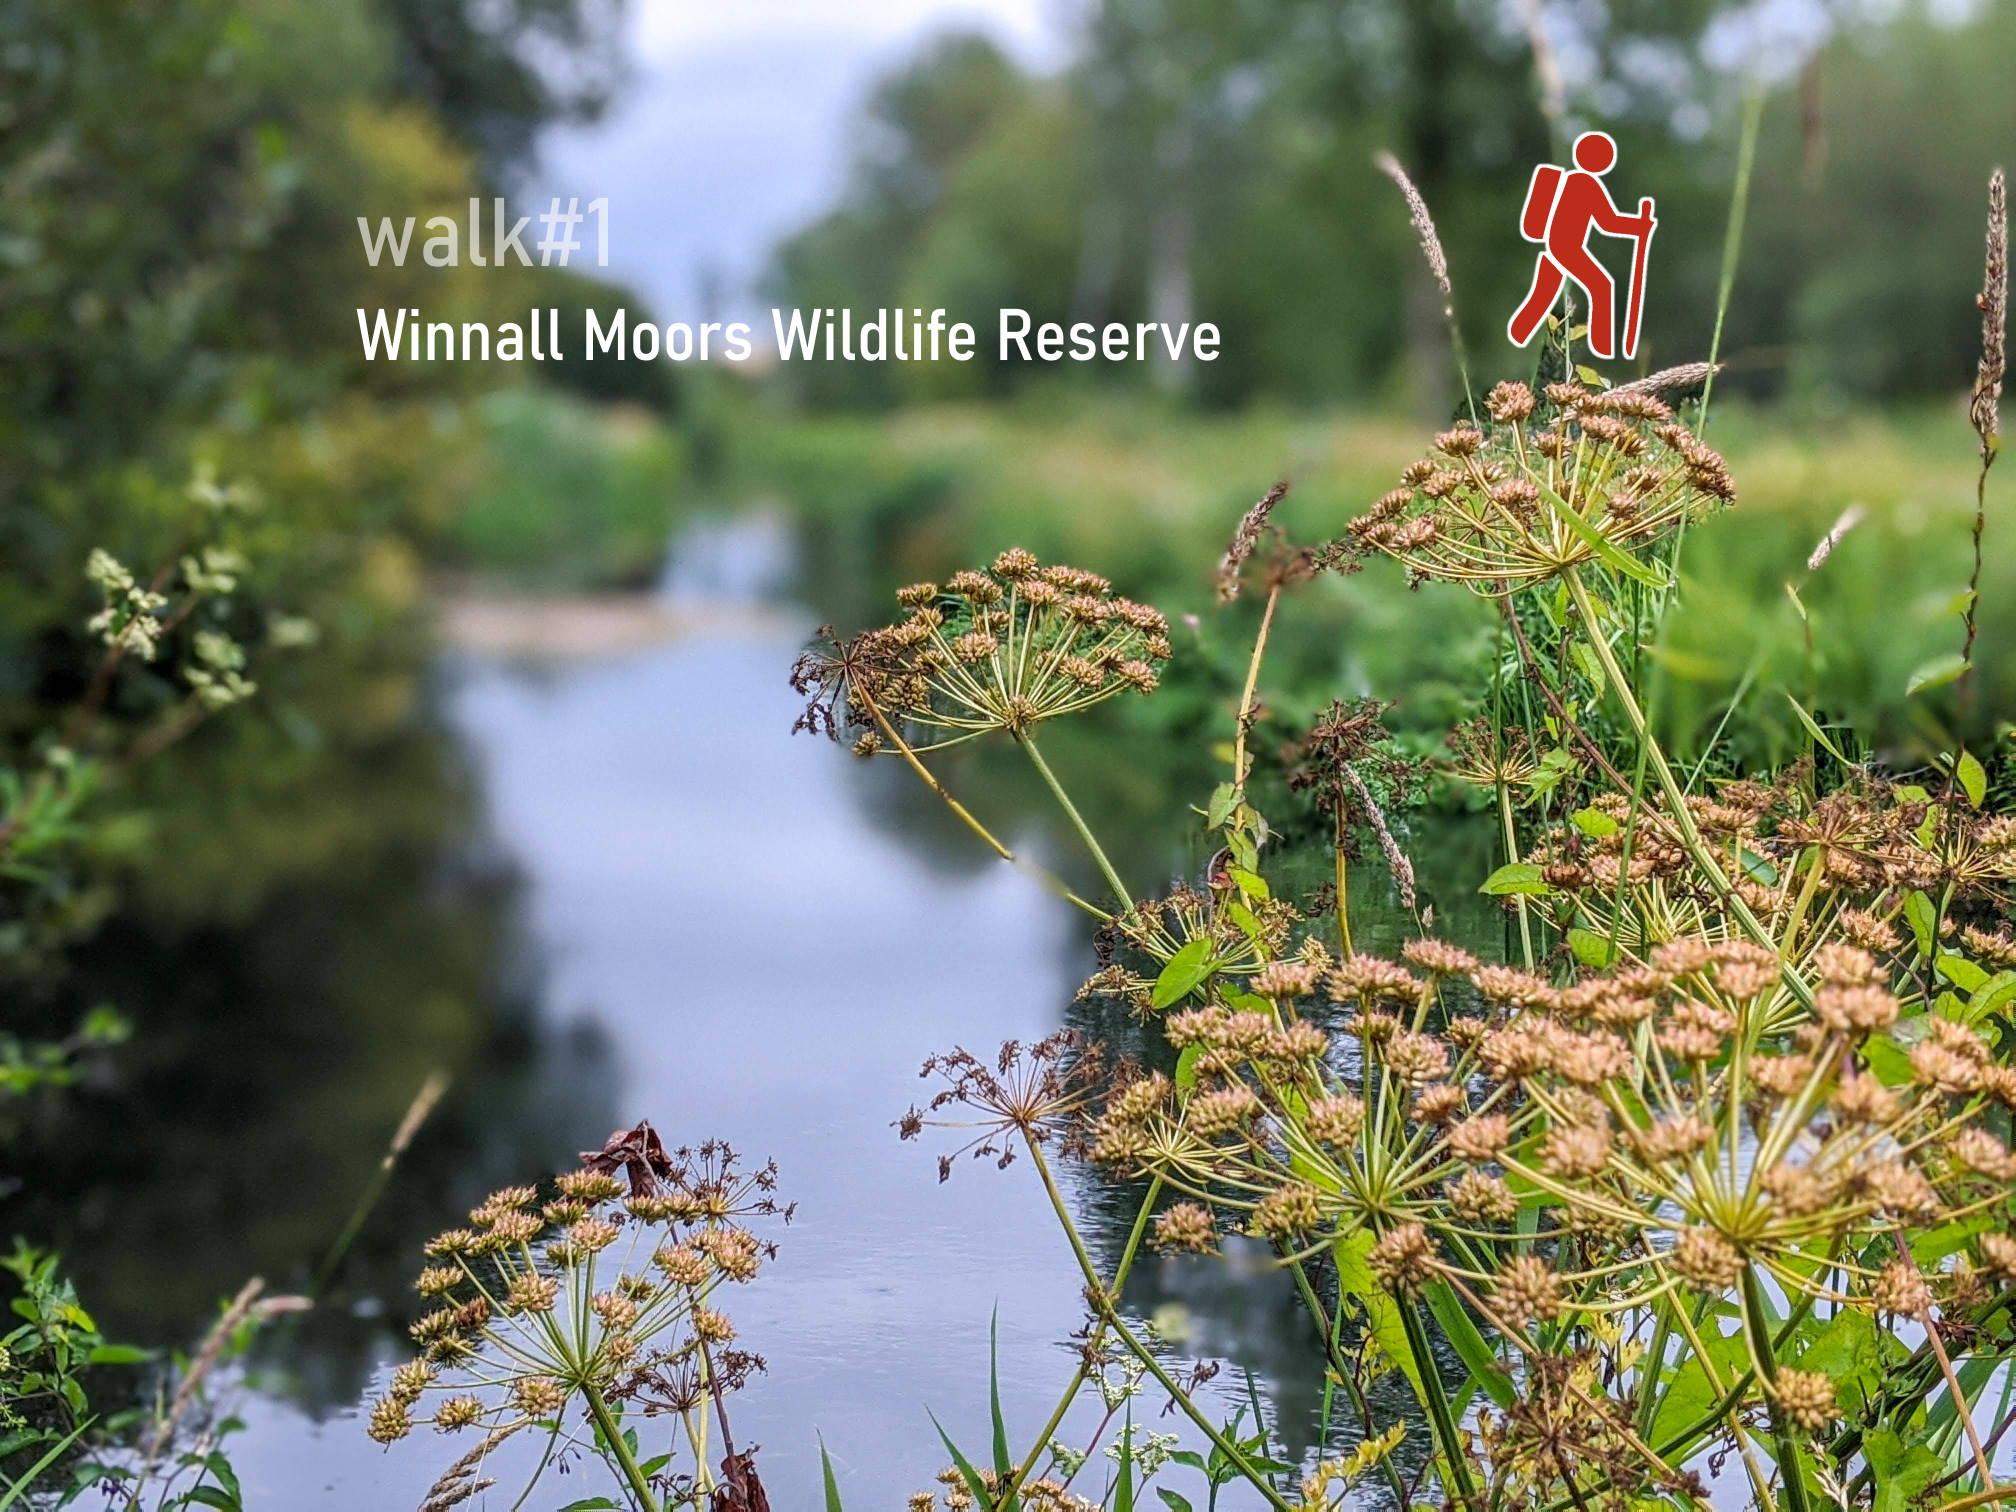 Winnall Moors Wildlife Reserve